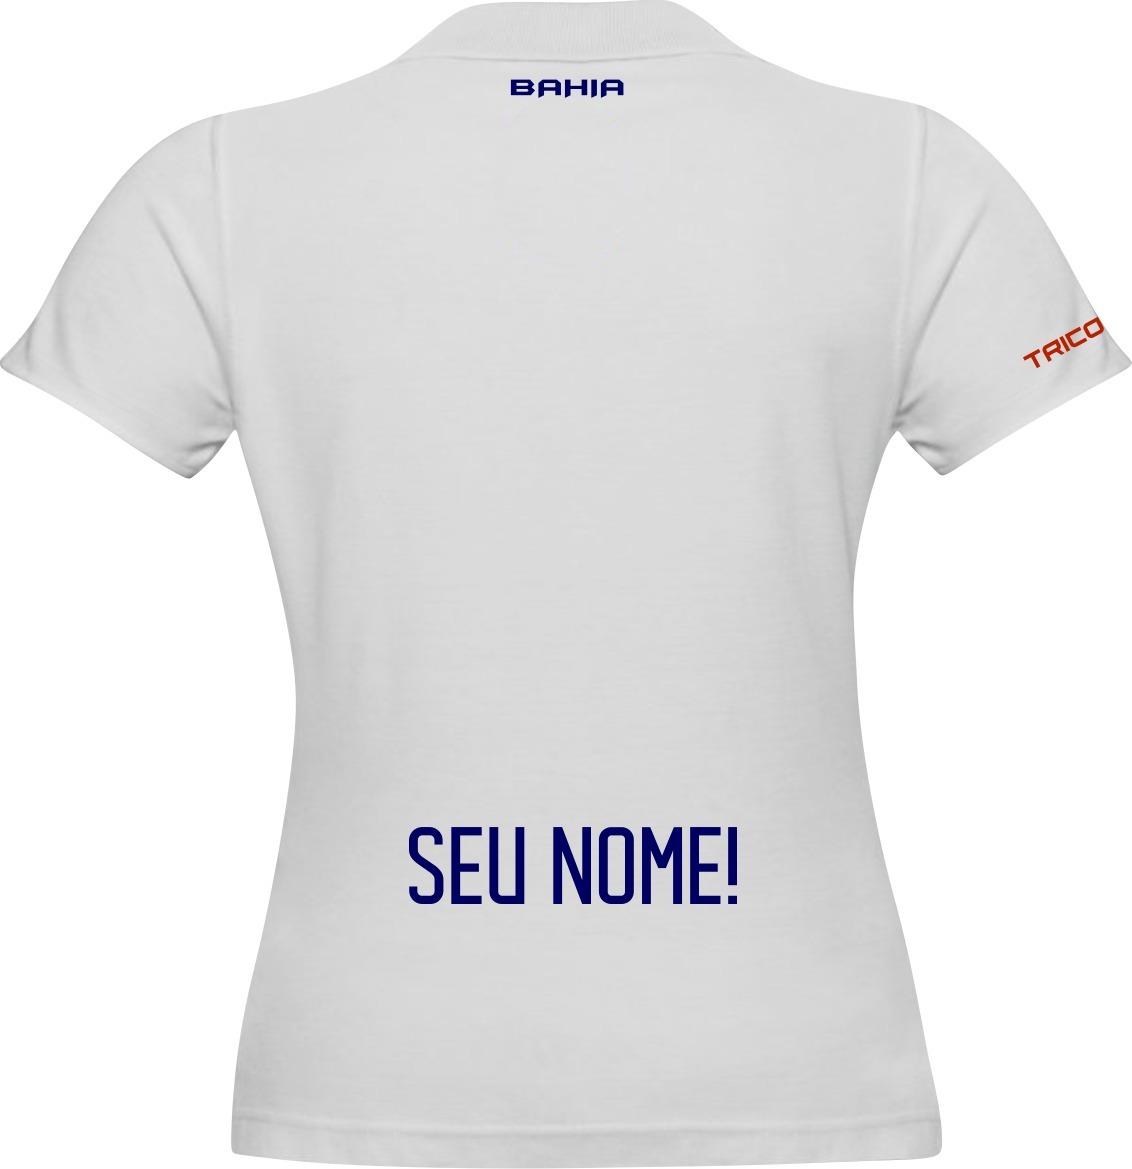 a52666c17d Camisa Raglan Bahia Futebol Personalizada Com Nome Mescla. Carregando zoom.